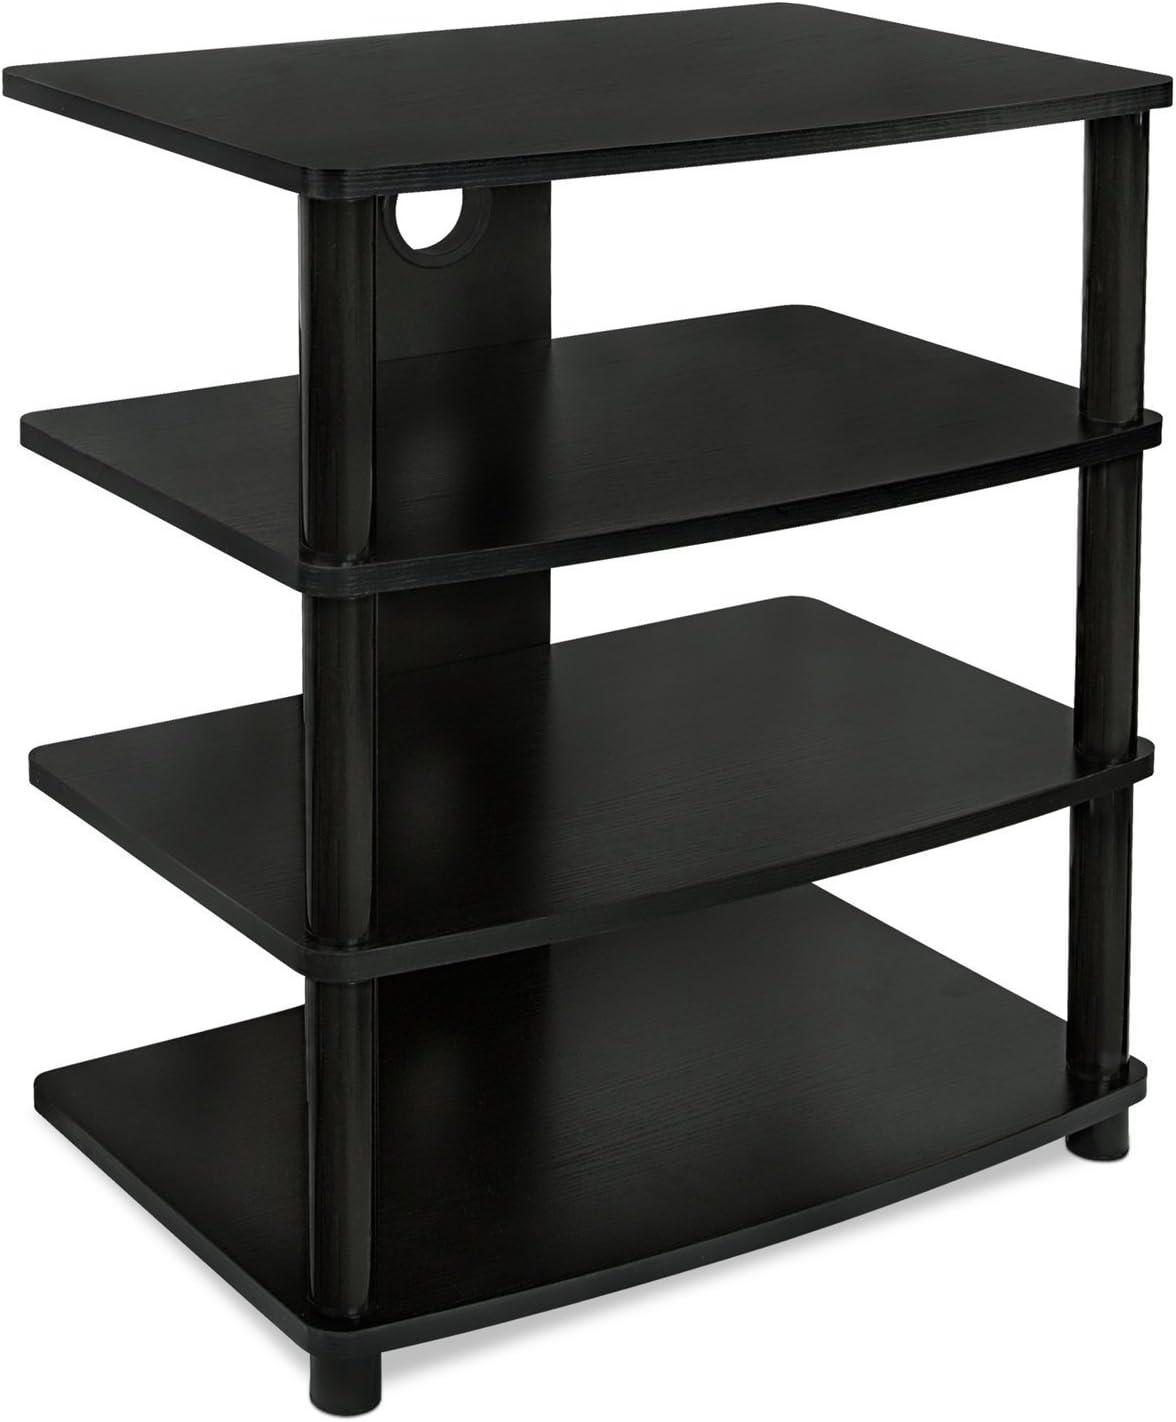 audio video shelving amazon com rh amazon com TV Wall Mounts with Shelves Wall Mount TV Component Shelf